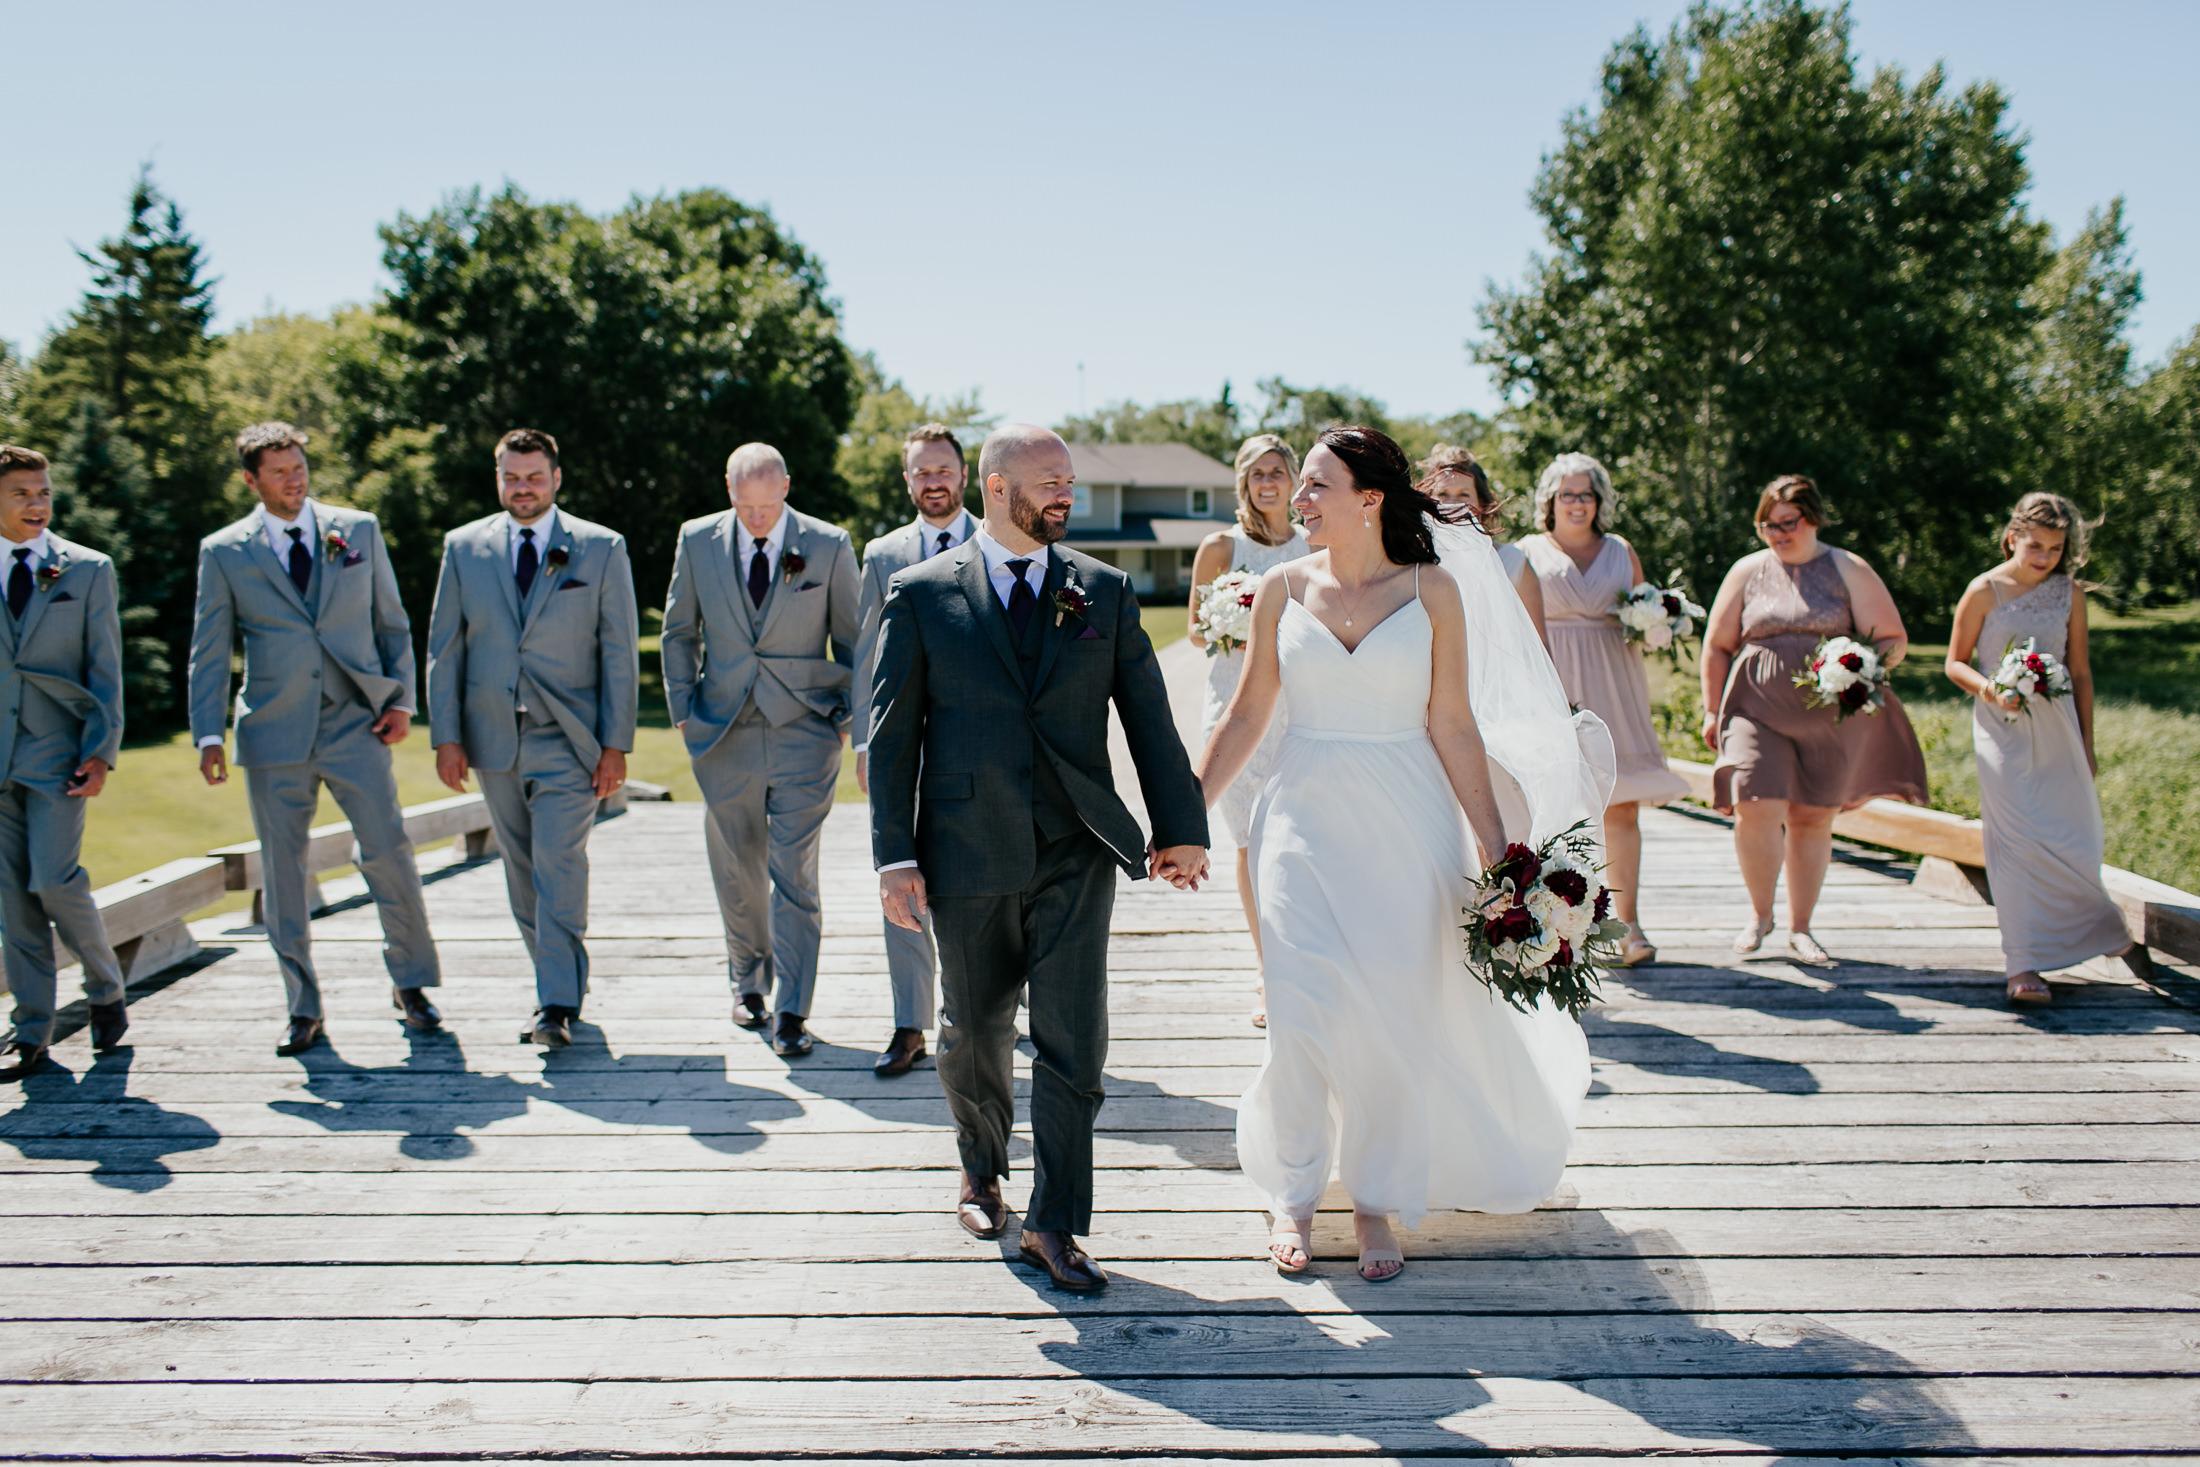 kevin&lori_wedding_020.jpg